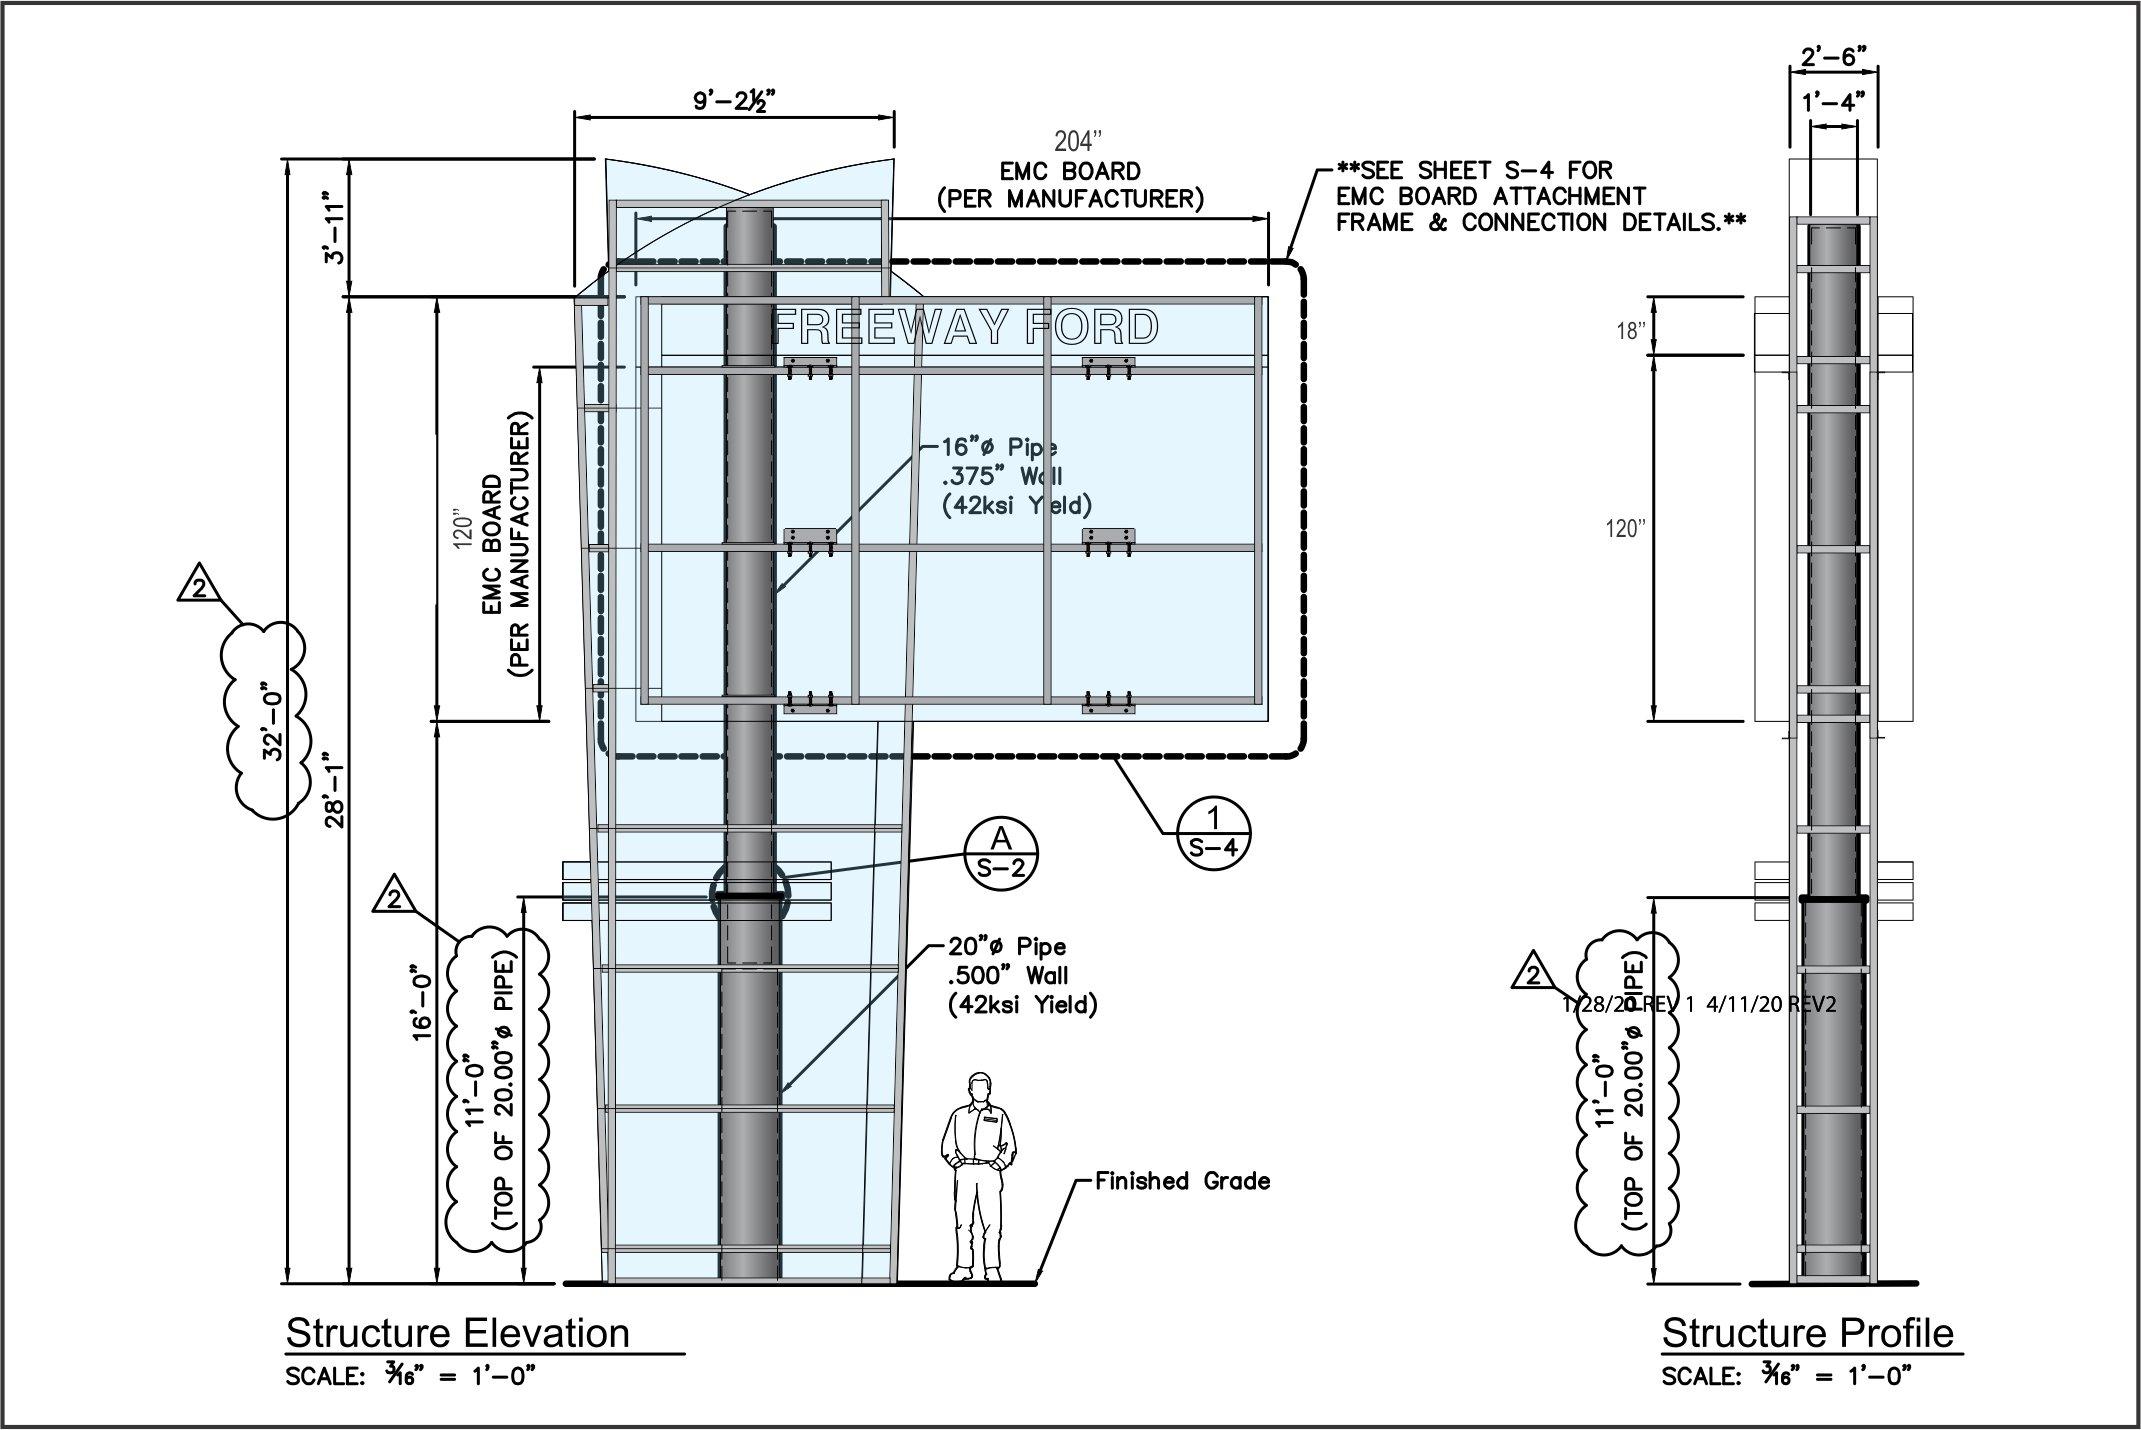 Structure Design Schematics | Outdoor Illuminated Business Signage